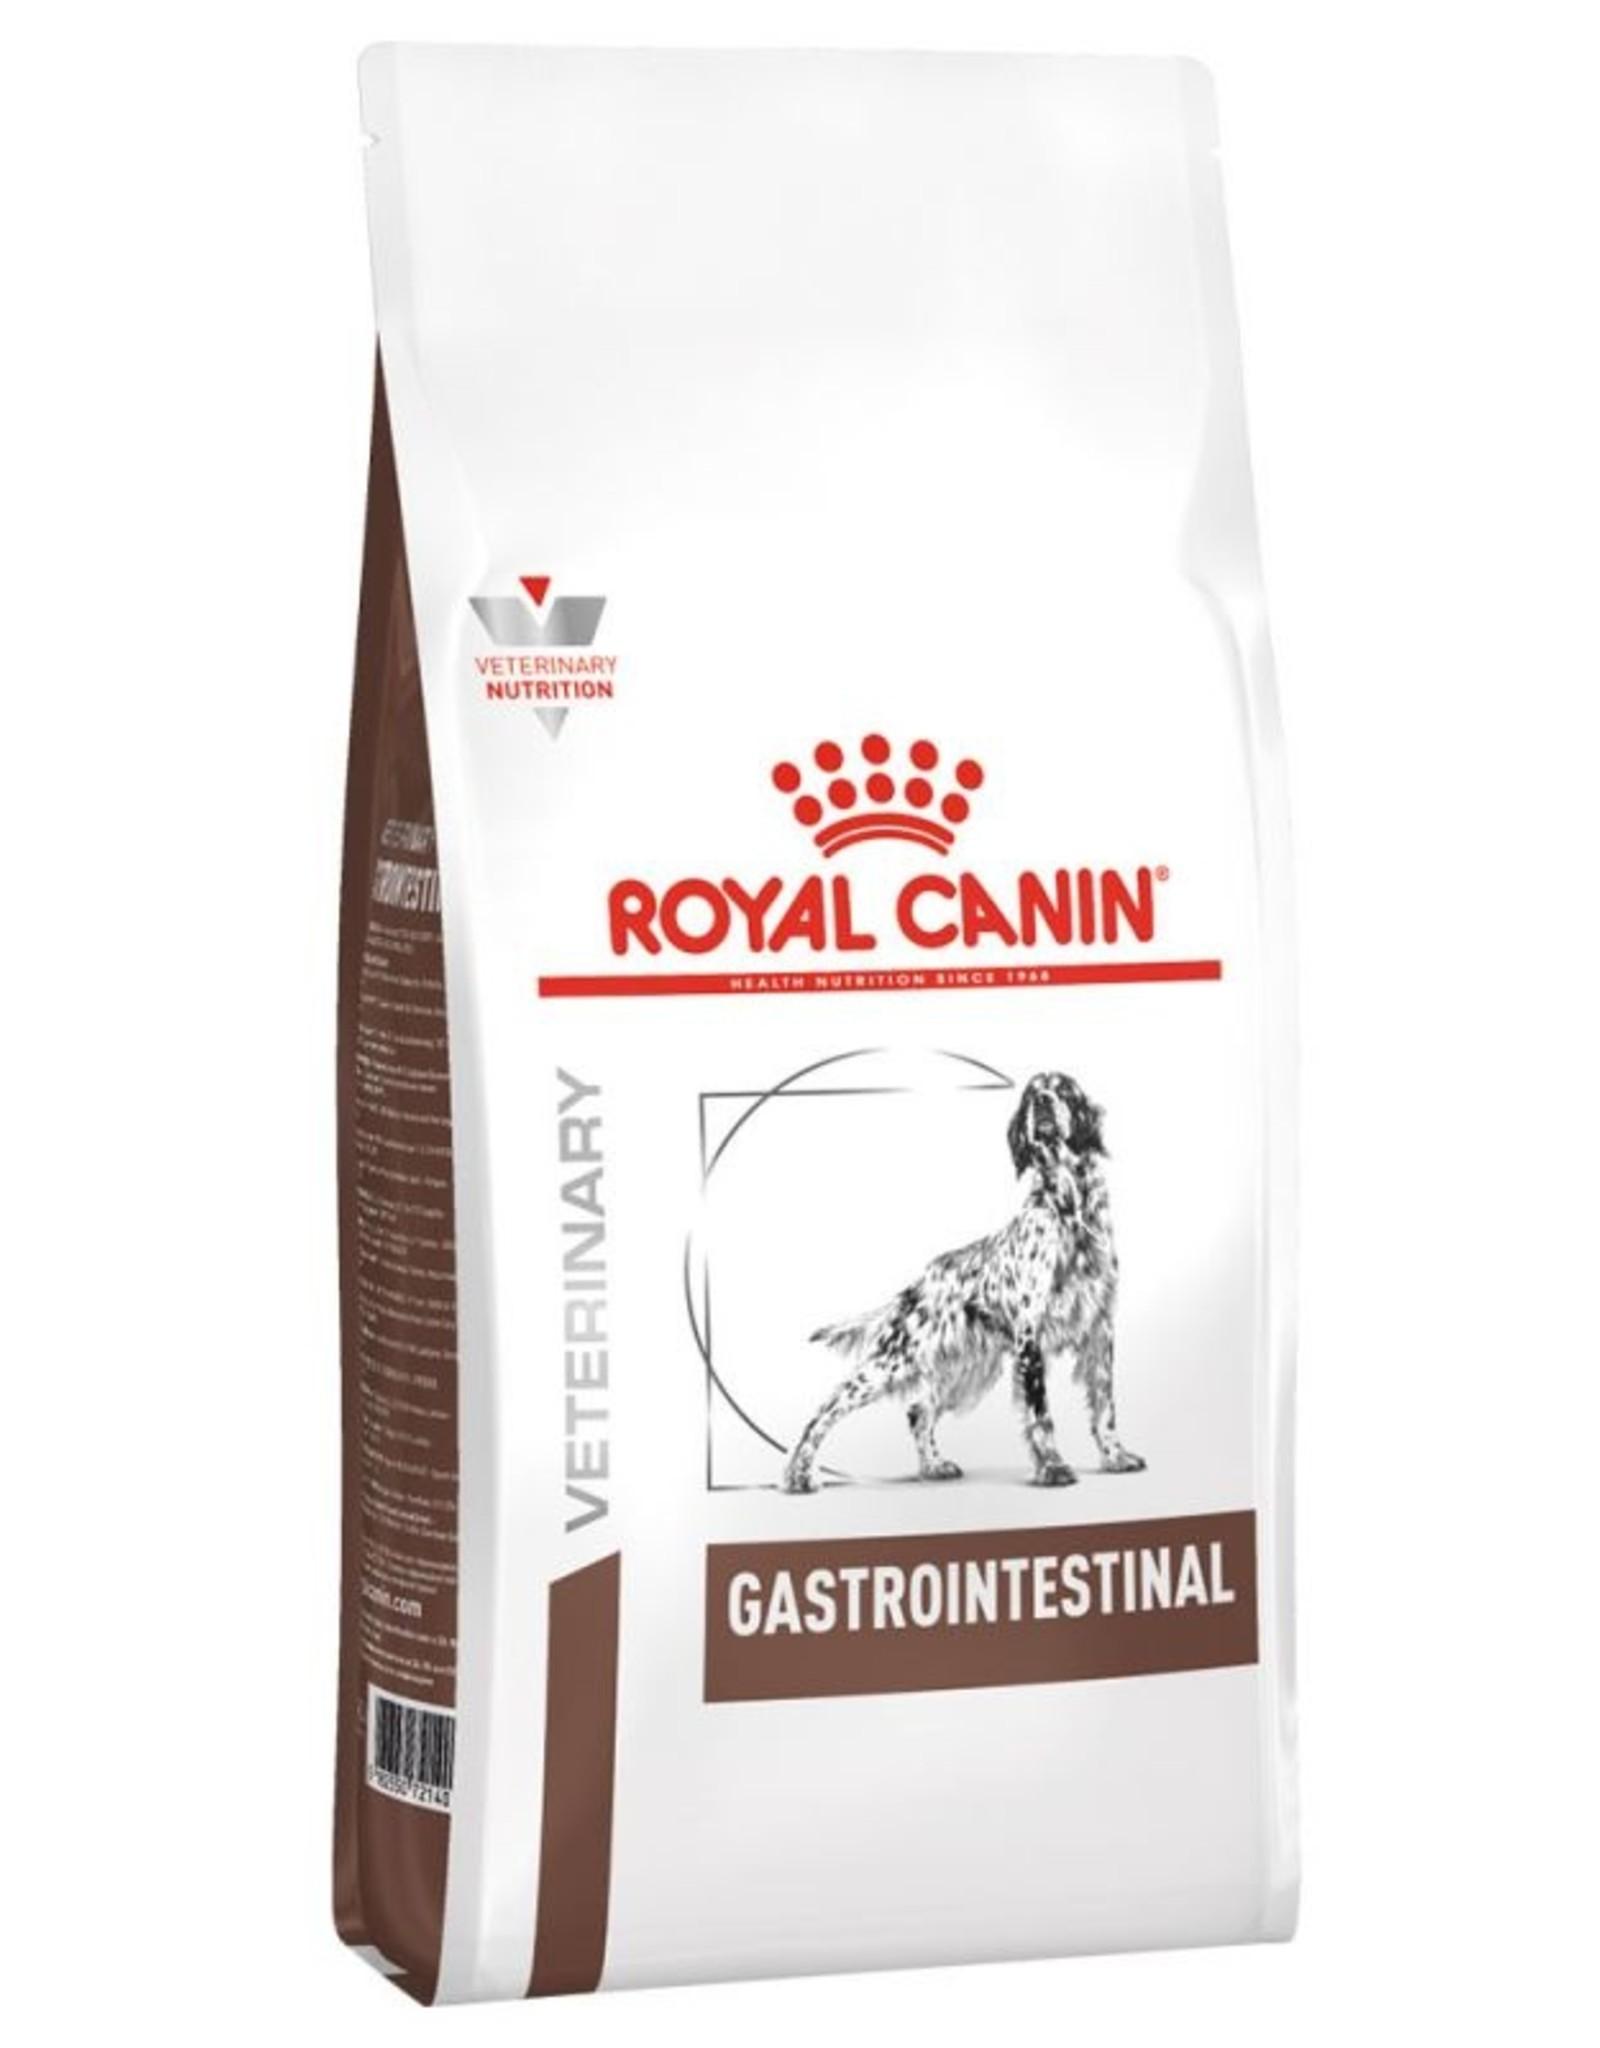 Royal Canin Royal Canin Gastro Intestinal Hond 2kg